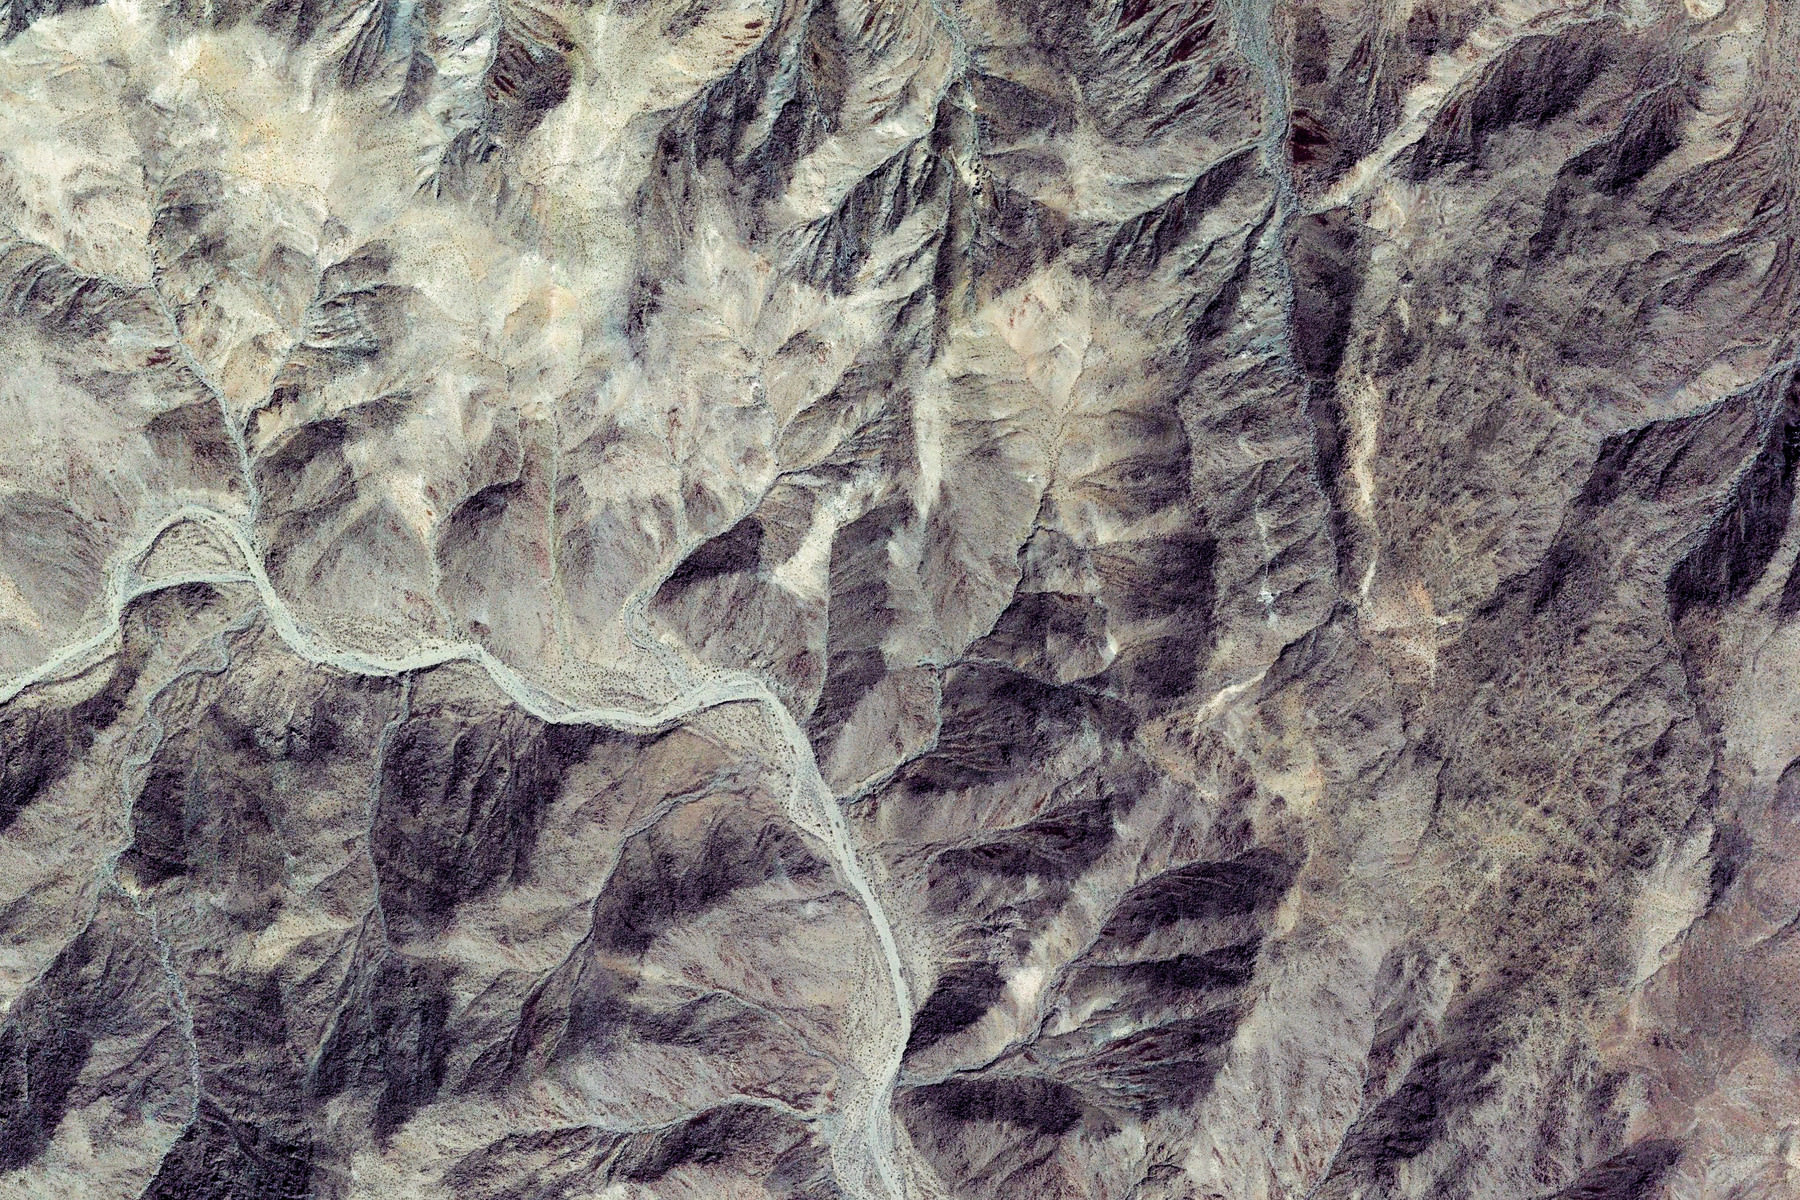 google-earth-US-RiversideCounty-1298